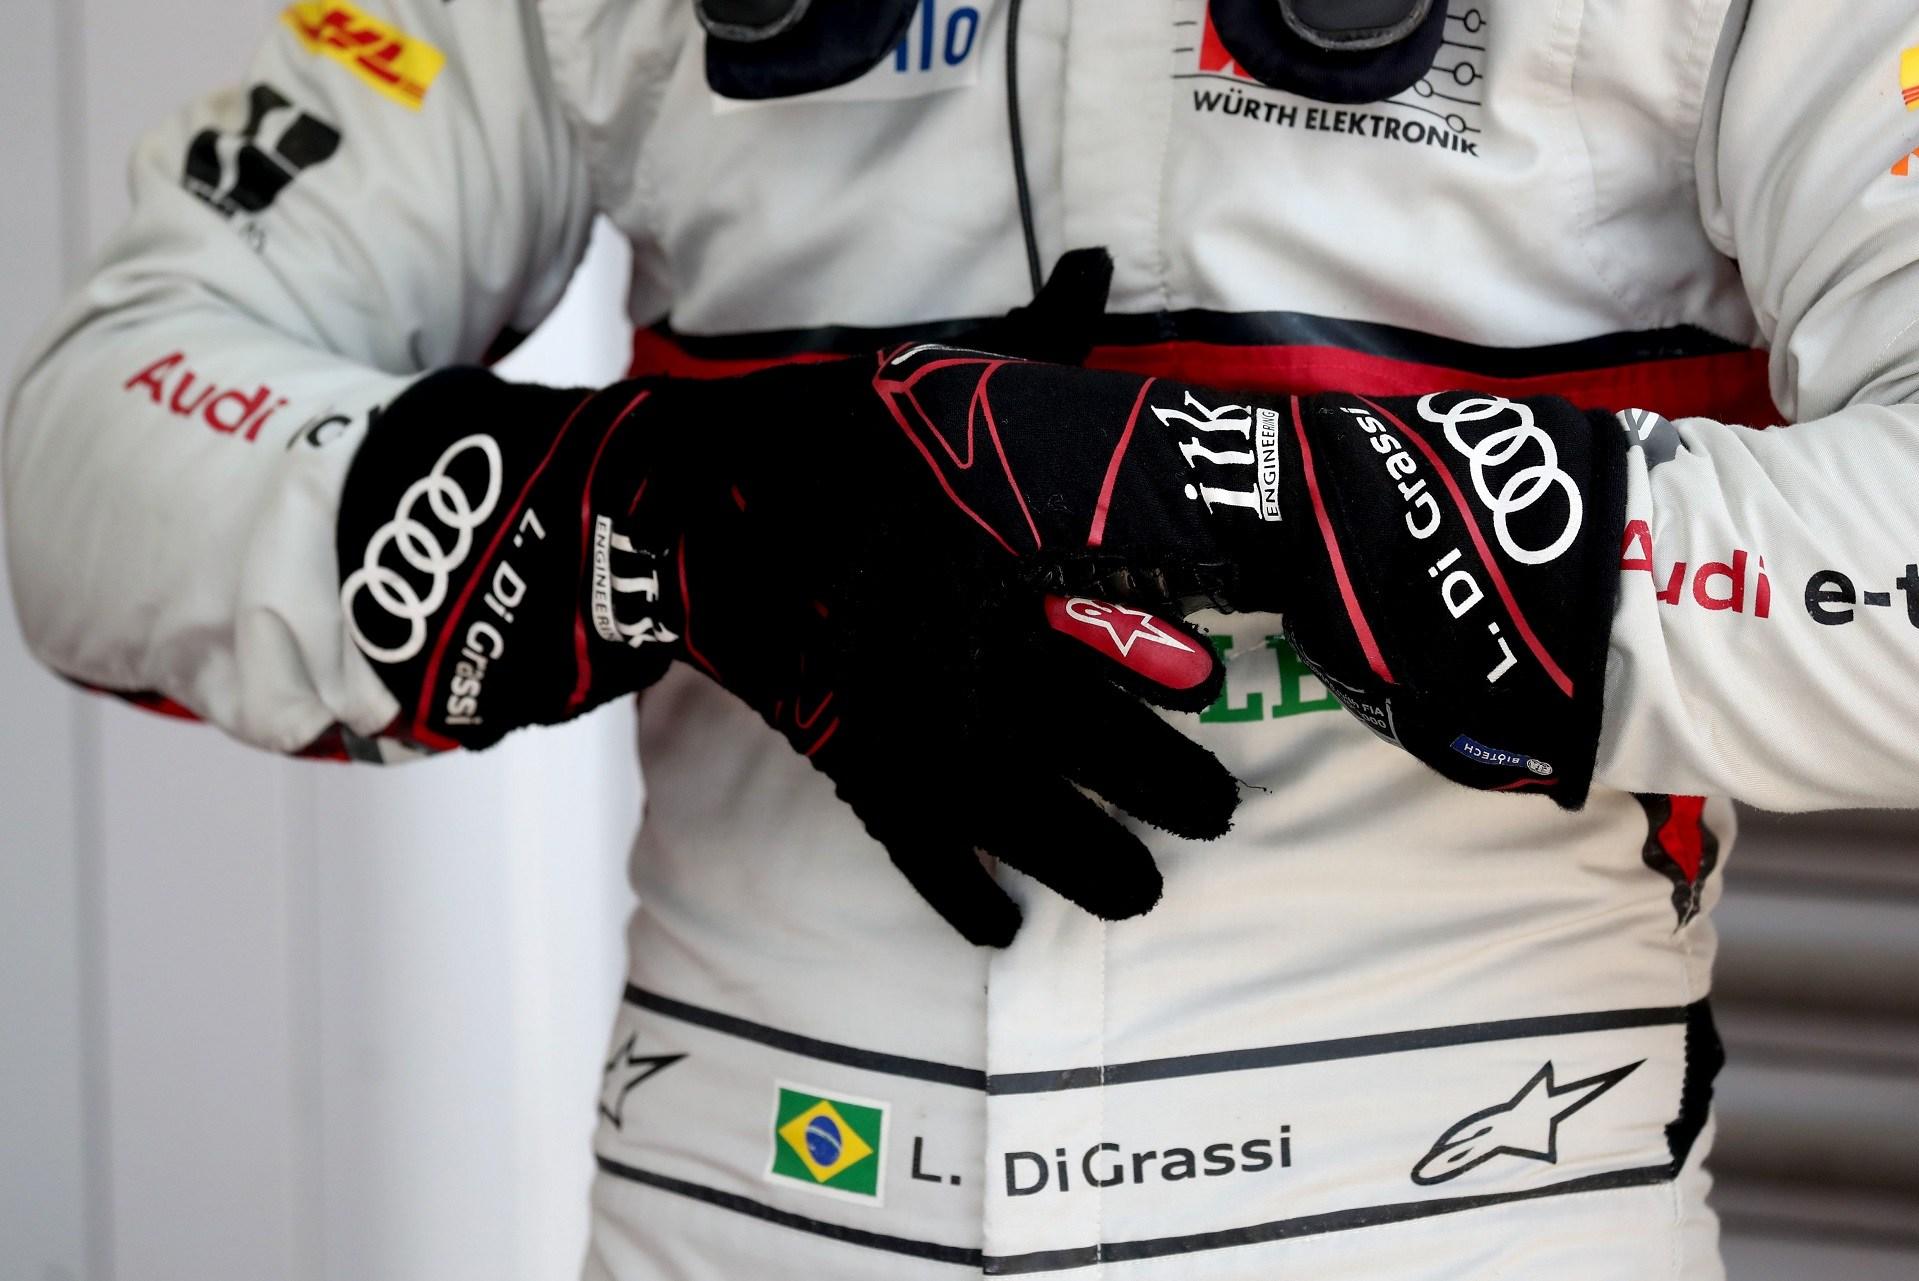 Formula E: Με νίκη ολοκλήρωσε το πρωτάθλημα η Audi στο τελευταίο E-Prix